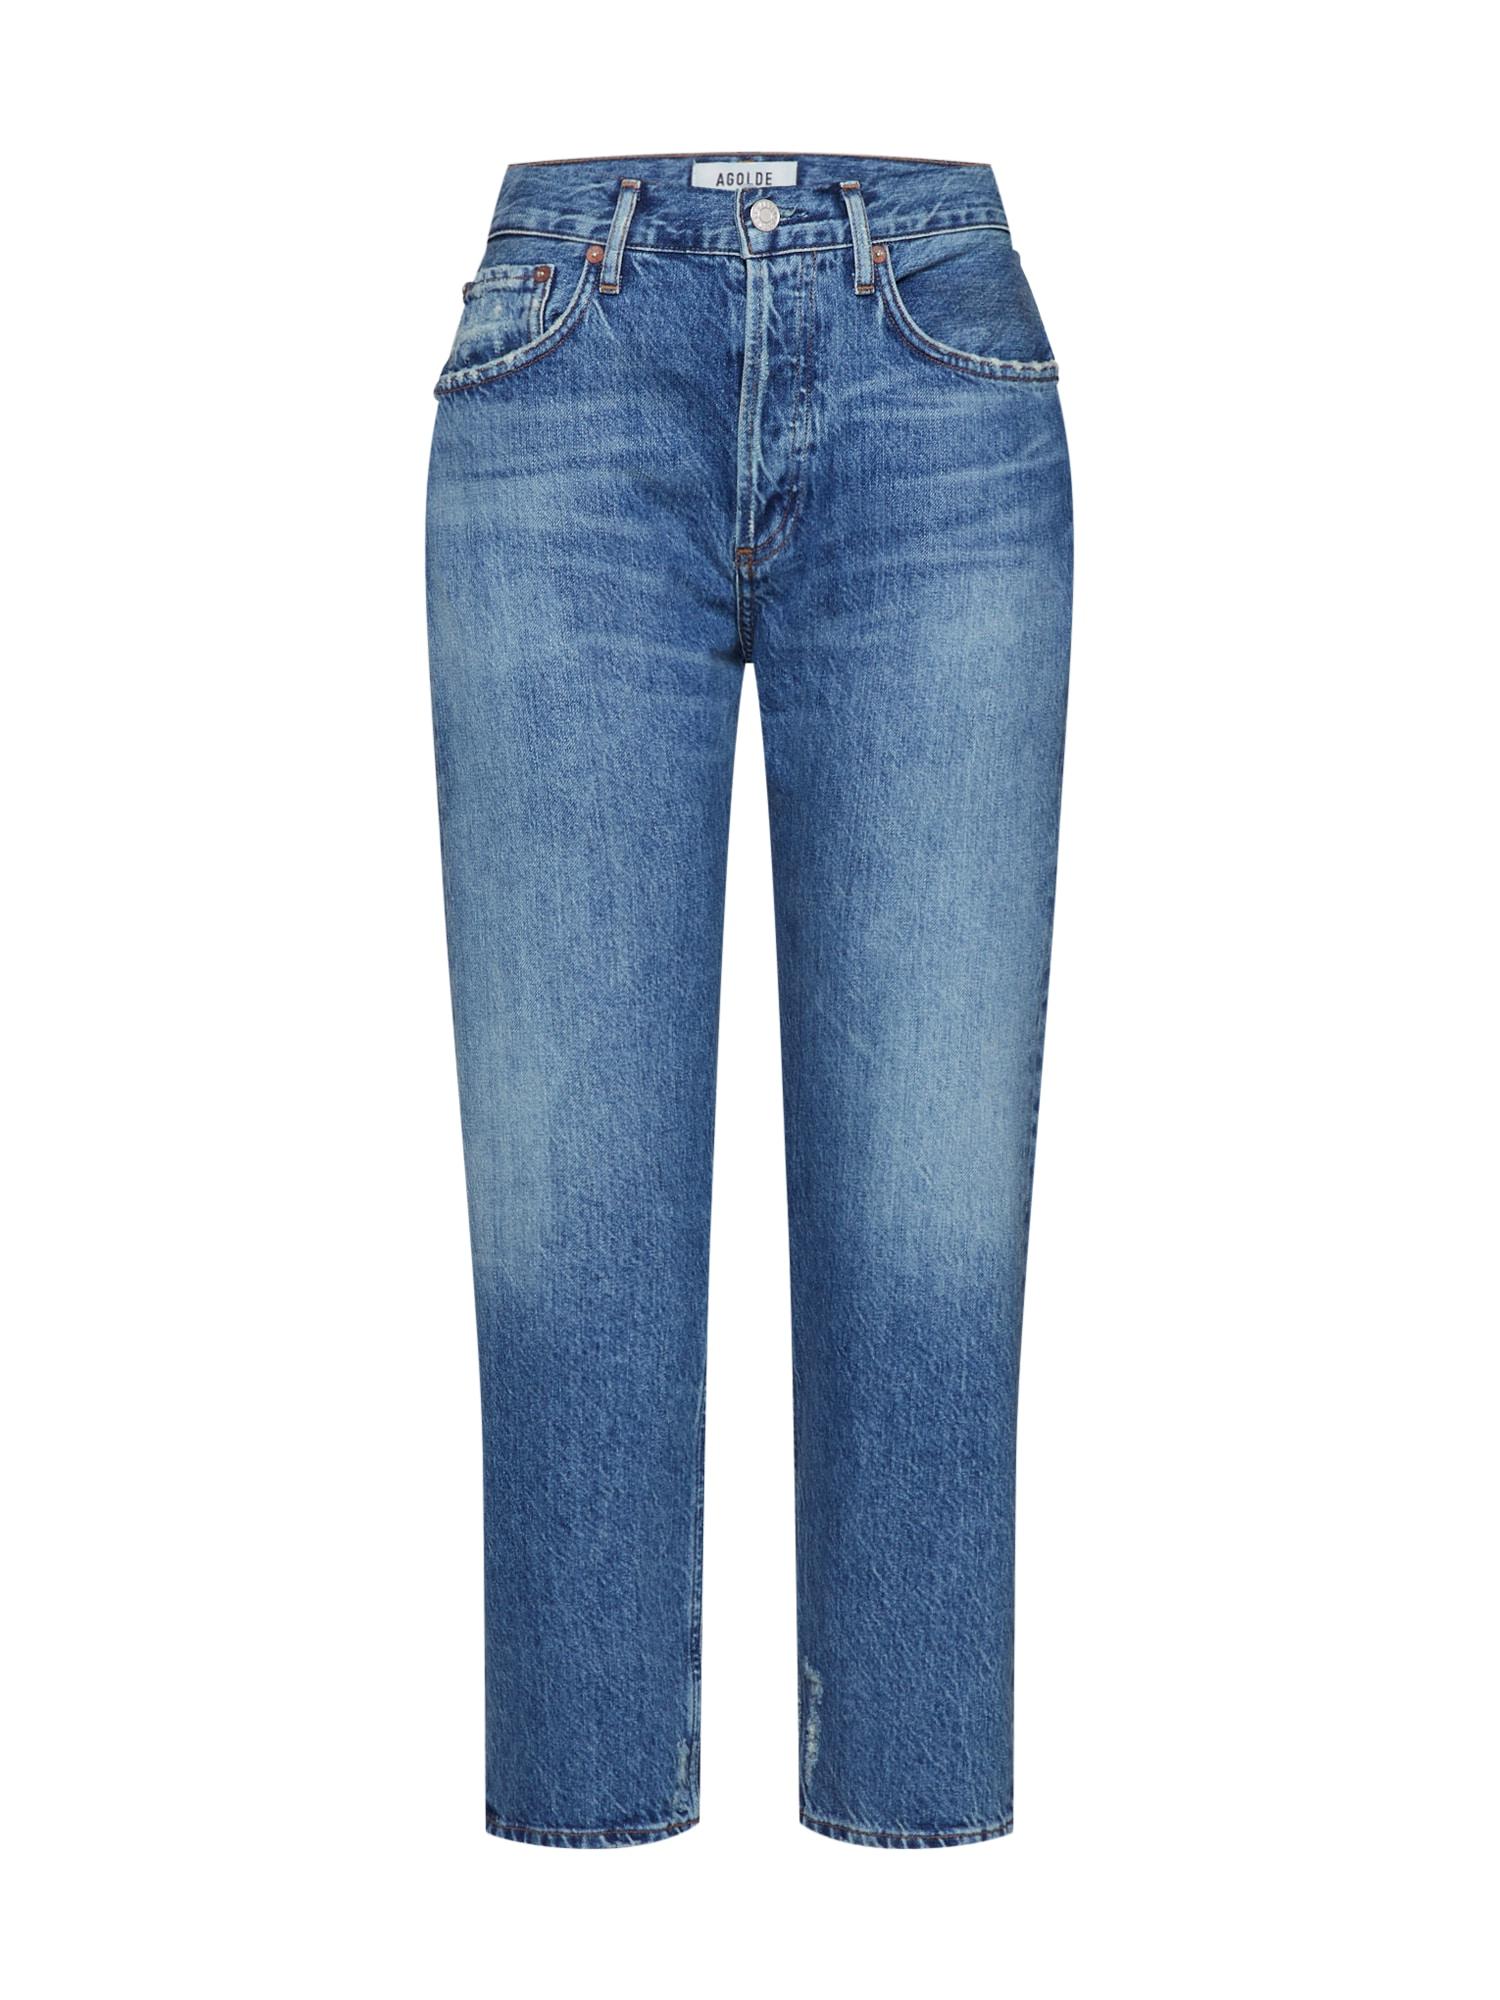 AGOLDE Džinsai 'Parker Jean' tamsiai (džinso) mėlyna